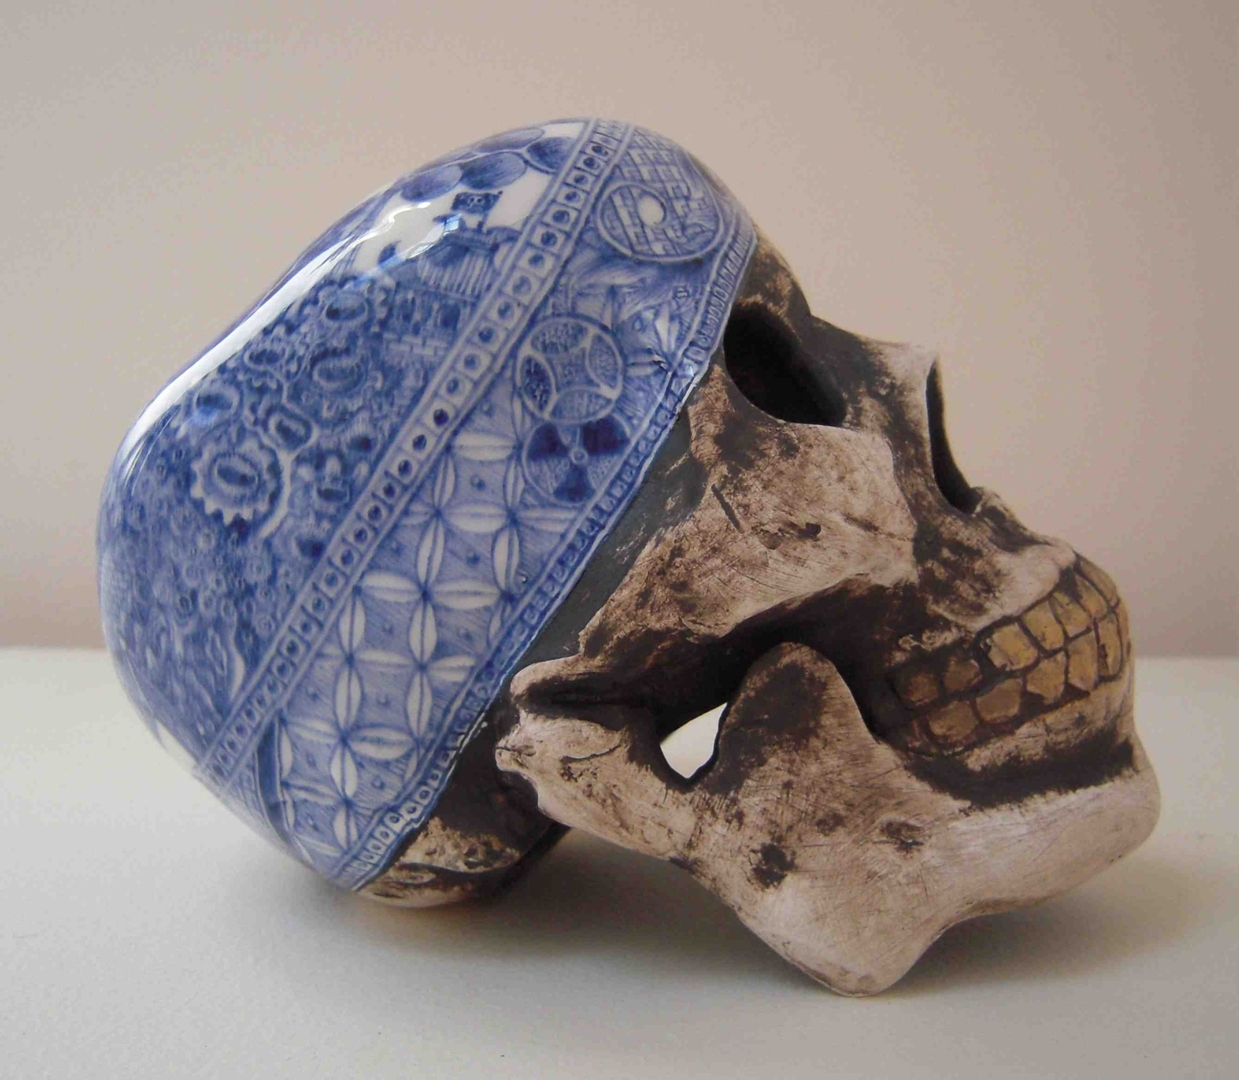 Pirate Skull 2012 image